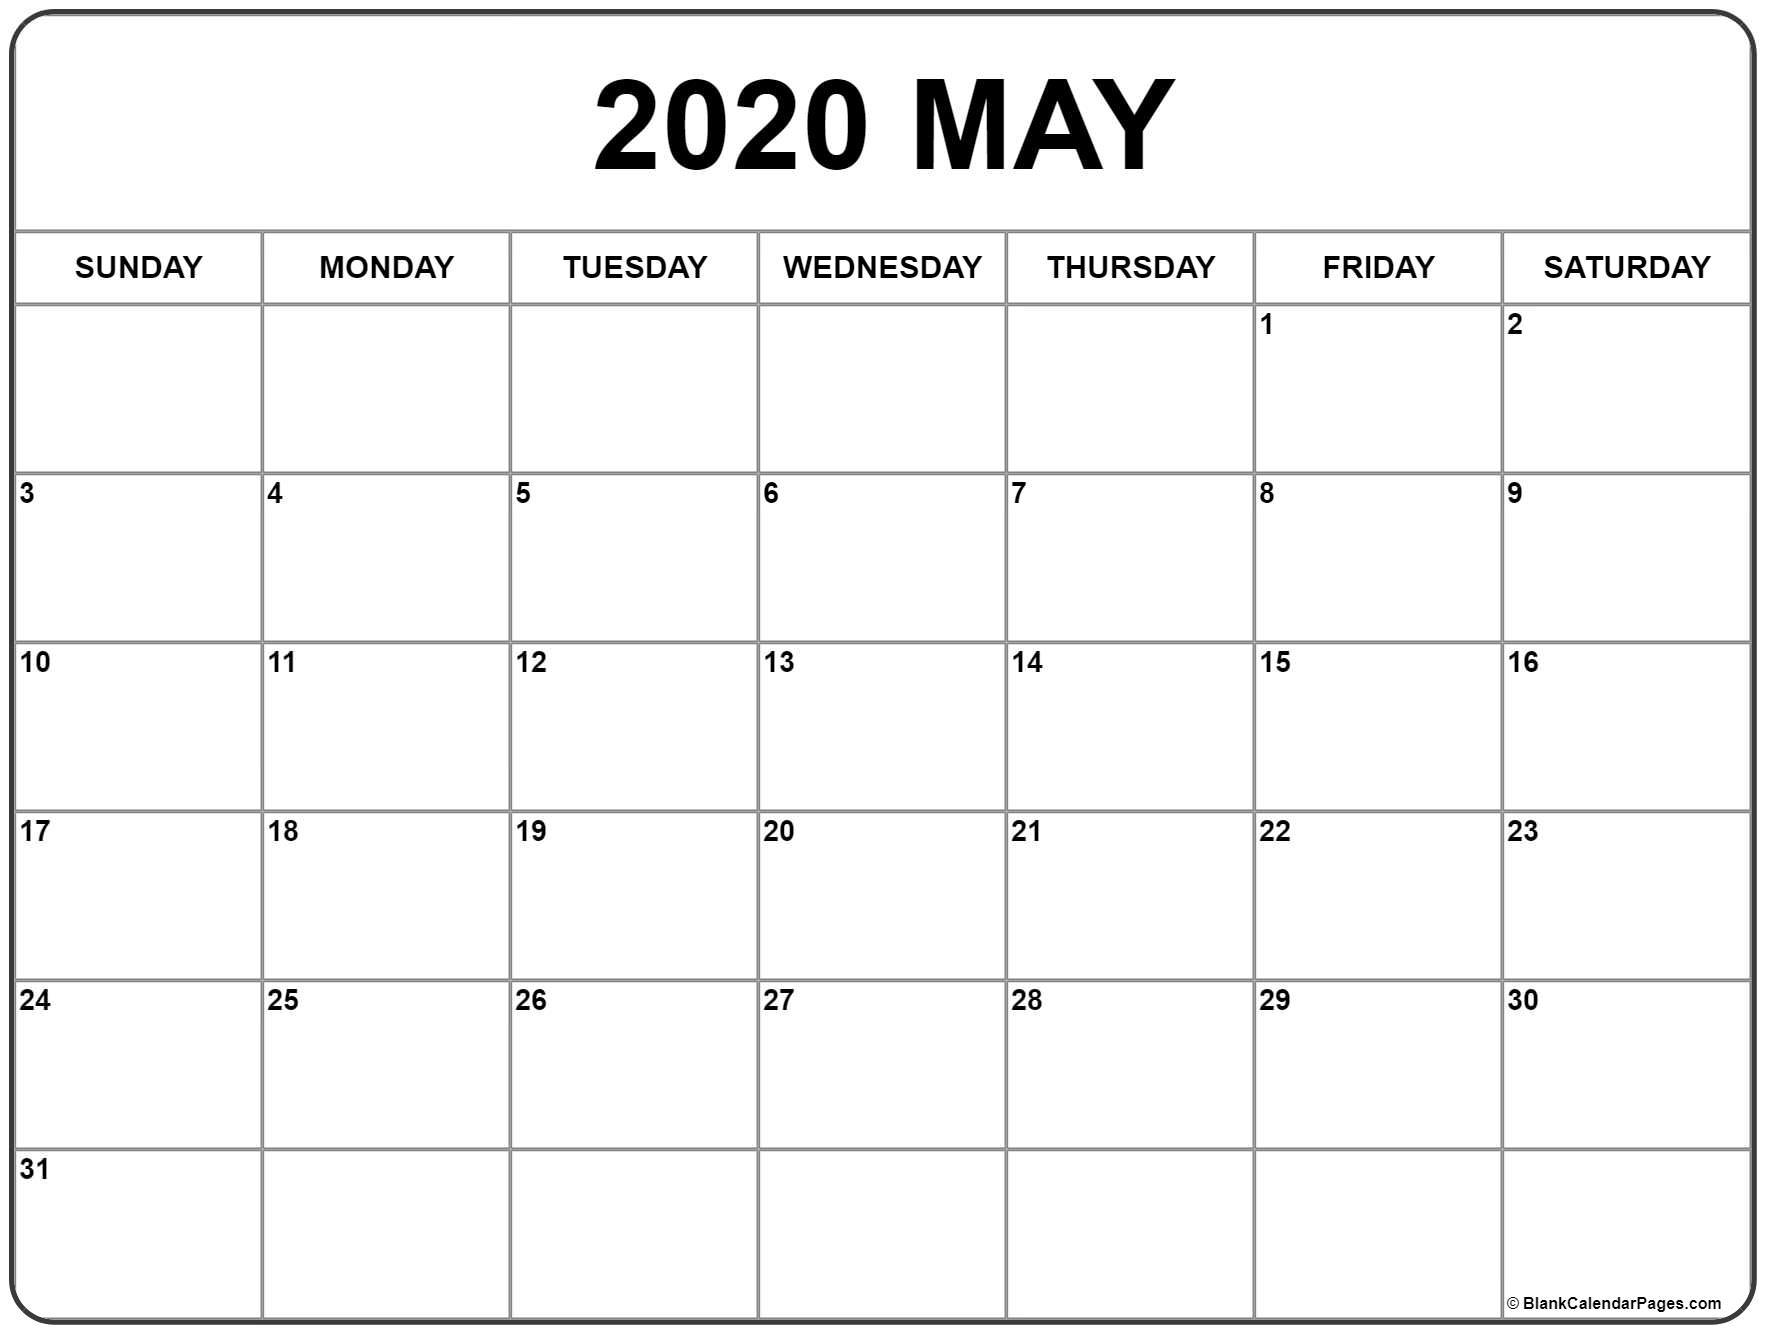 May 2020 Calendar   Free Printable Monthly Calendars